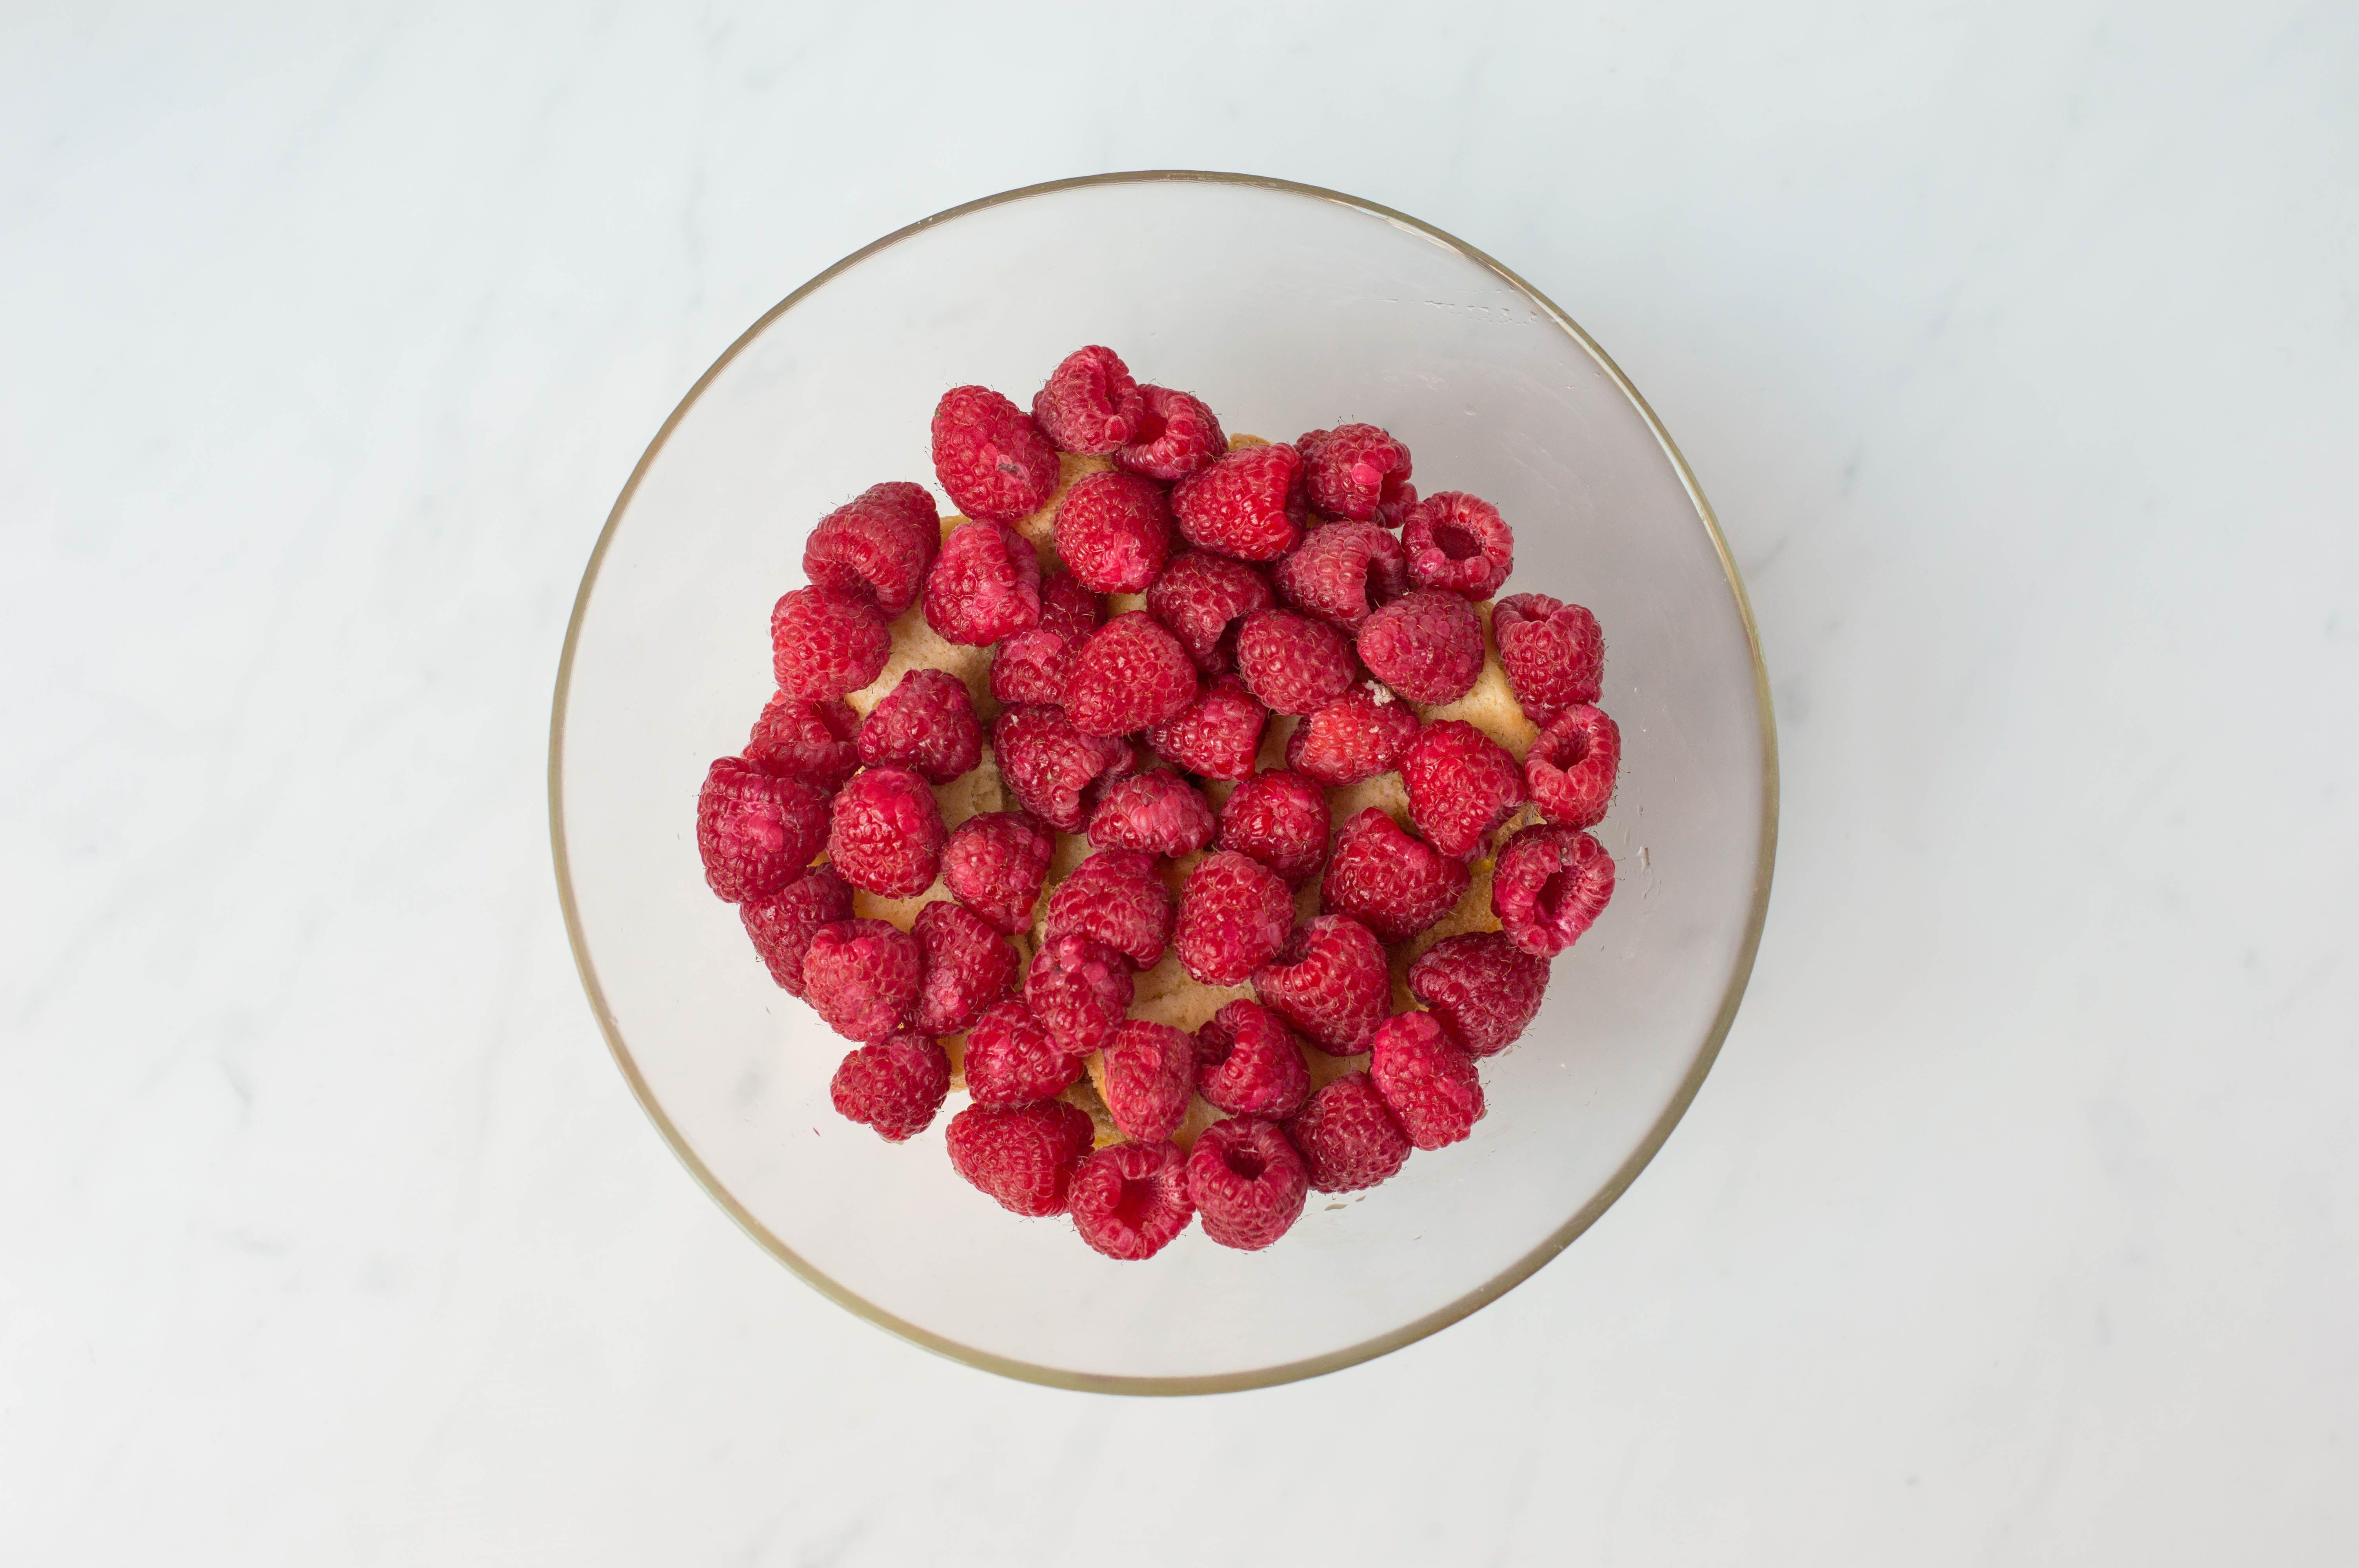 layer raspberries on top of cake